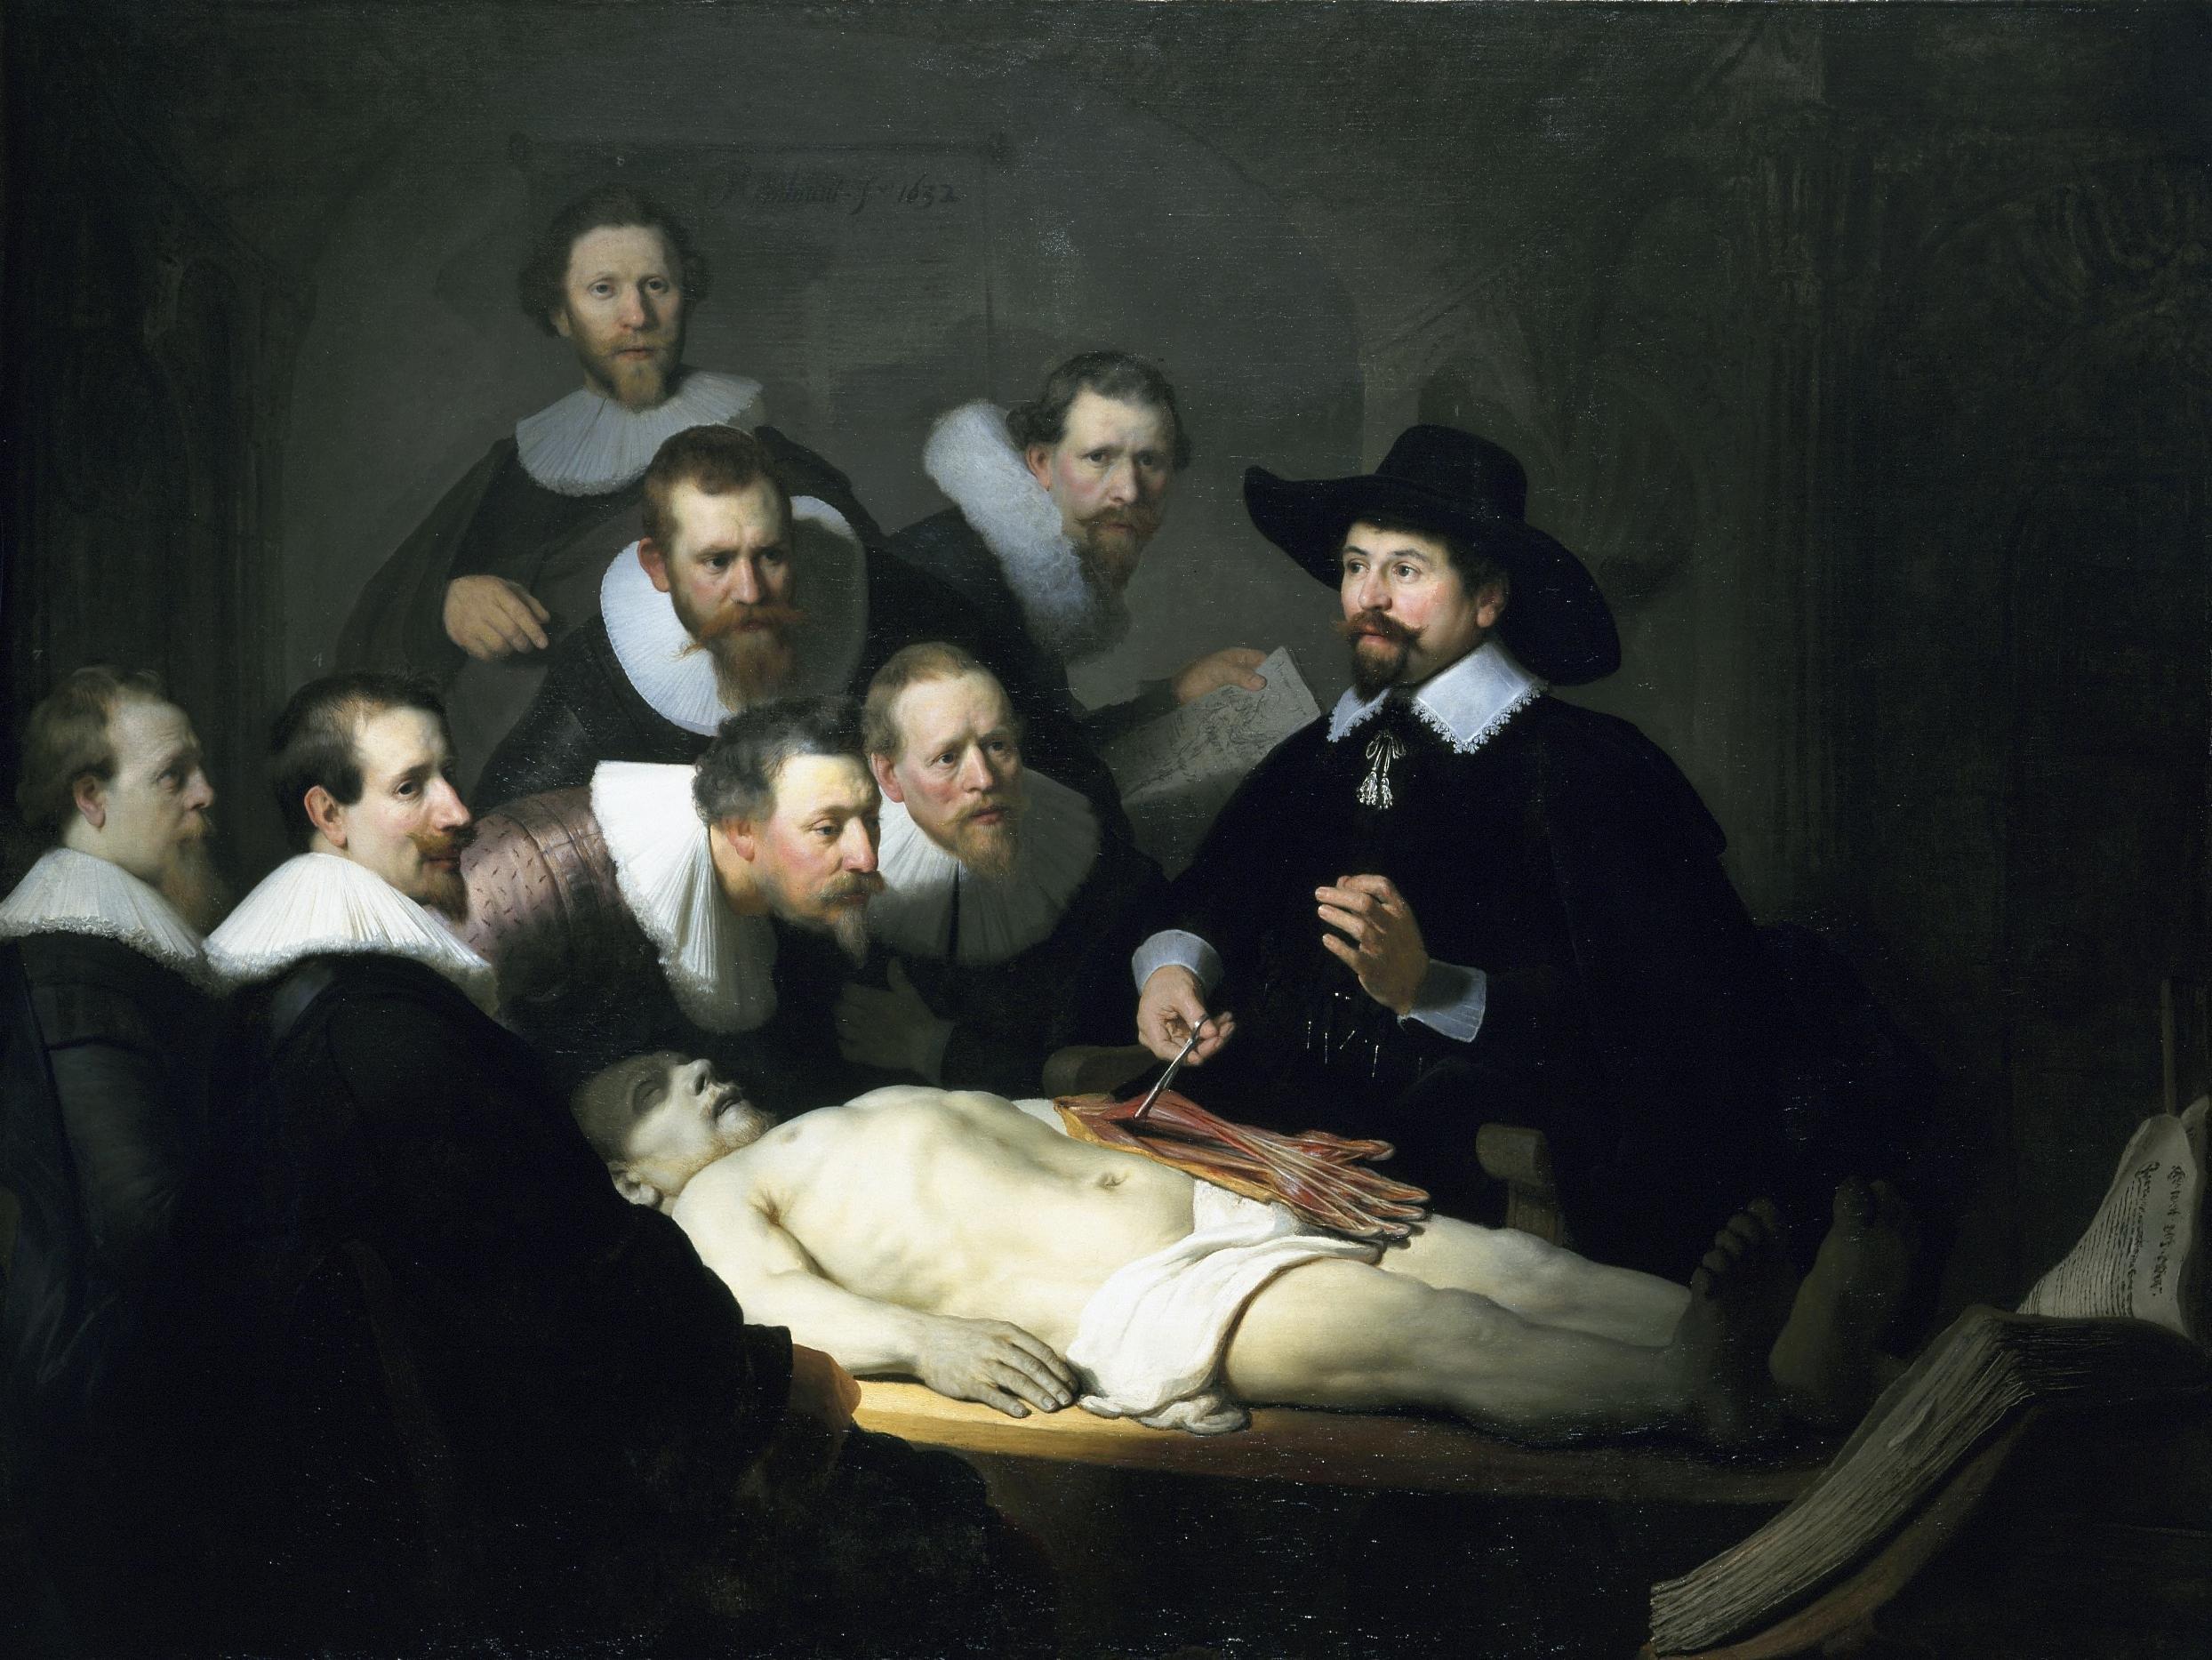 https://i1.wp.com/upload.wikimedia.org/wikipedia/commons/8/8c/The_Anatomy_Lesson.jpg